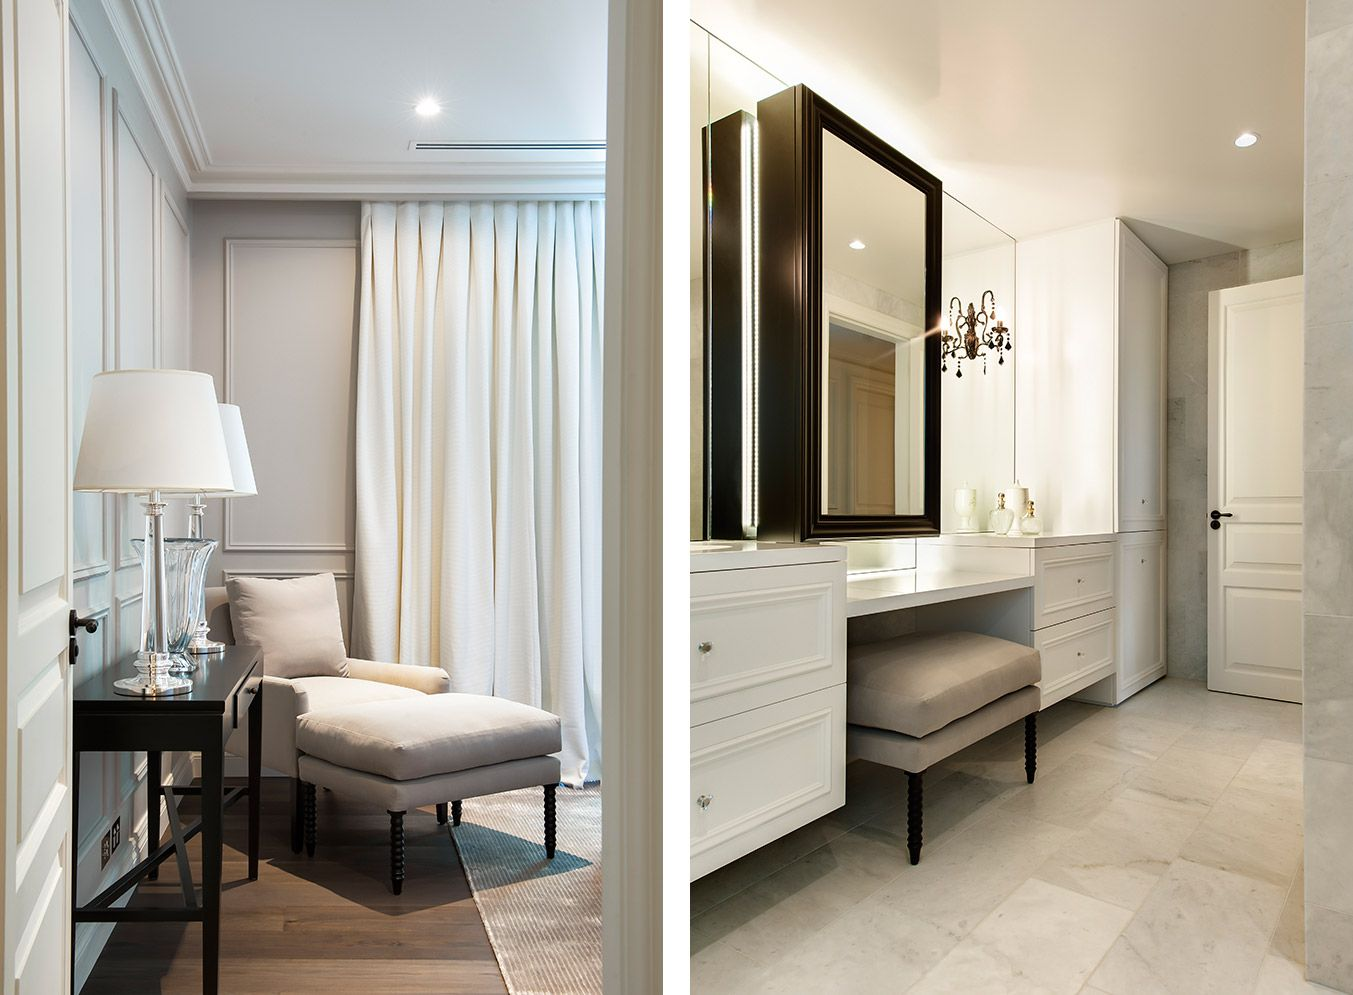 BELLEVUE HILL RESIDENCE | Tonka Andjelkovic Design: Interior Designer,  Residential And Commercial Interior Design